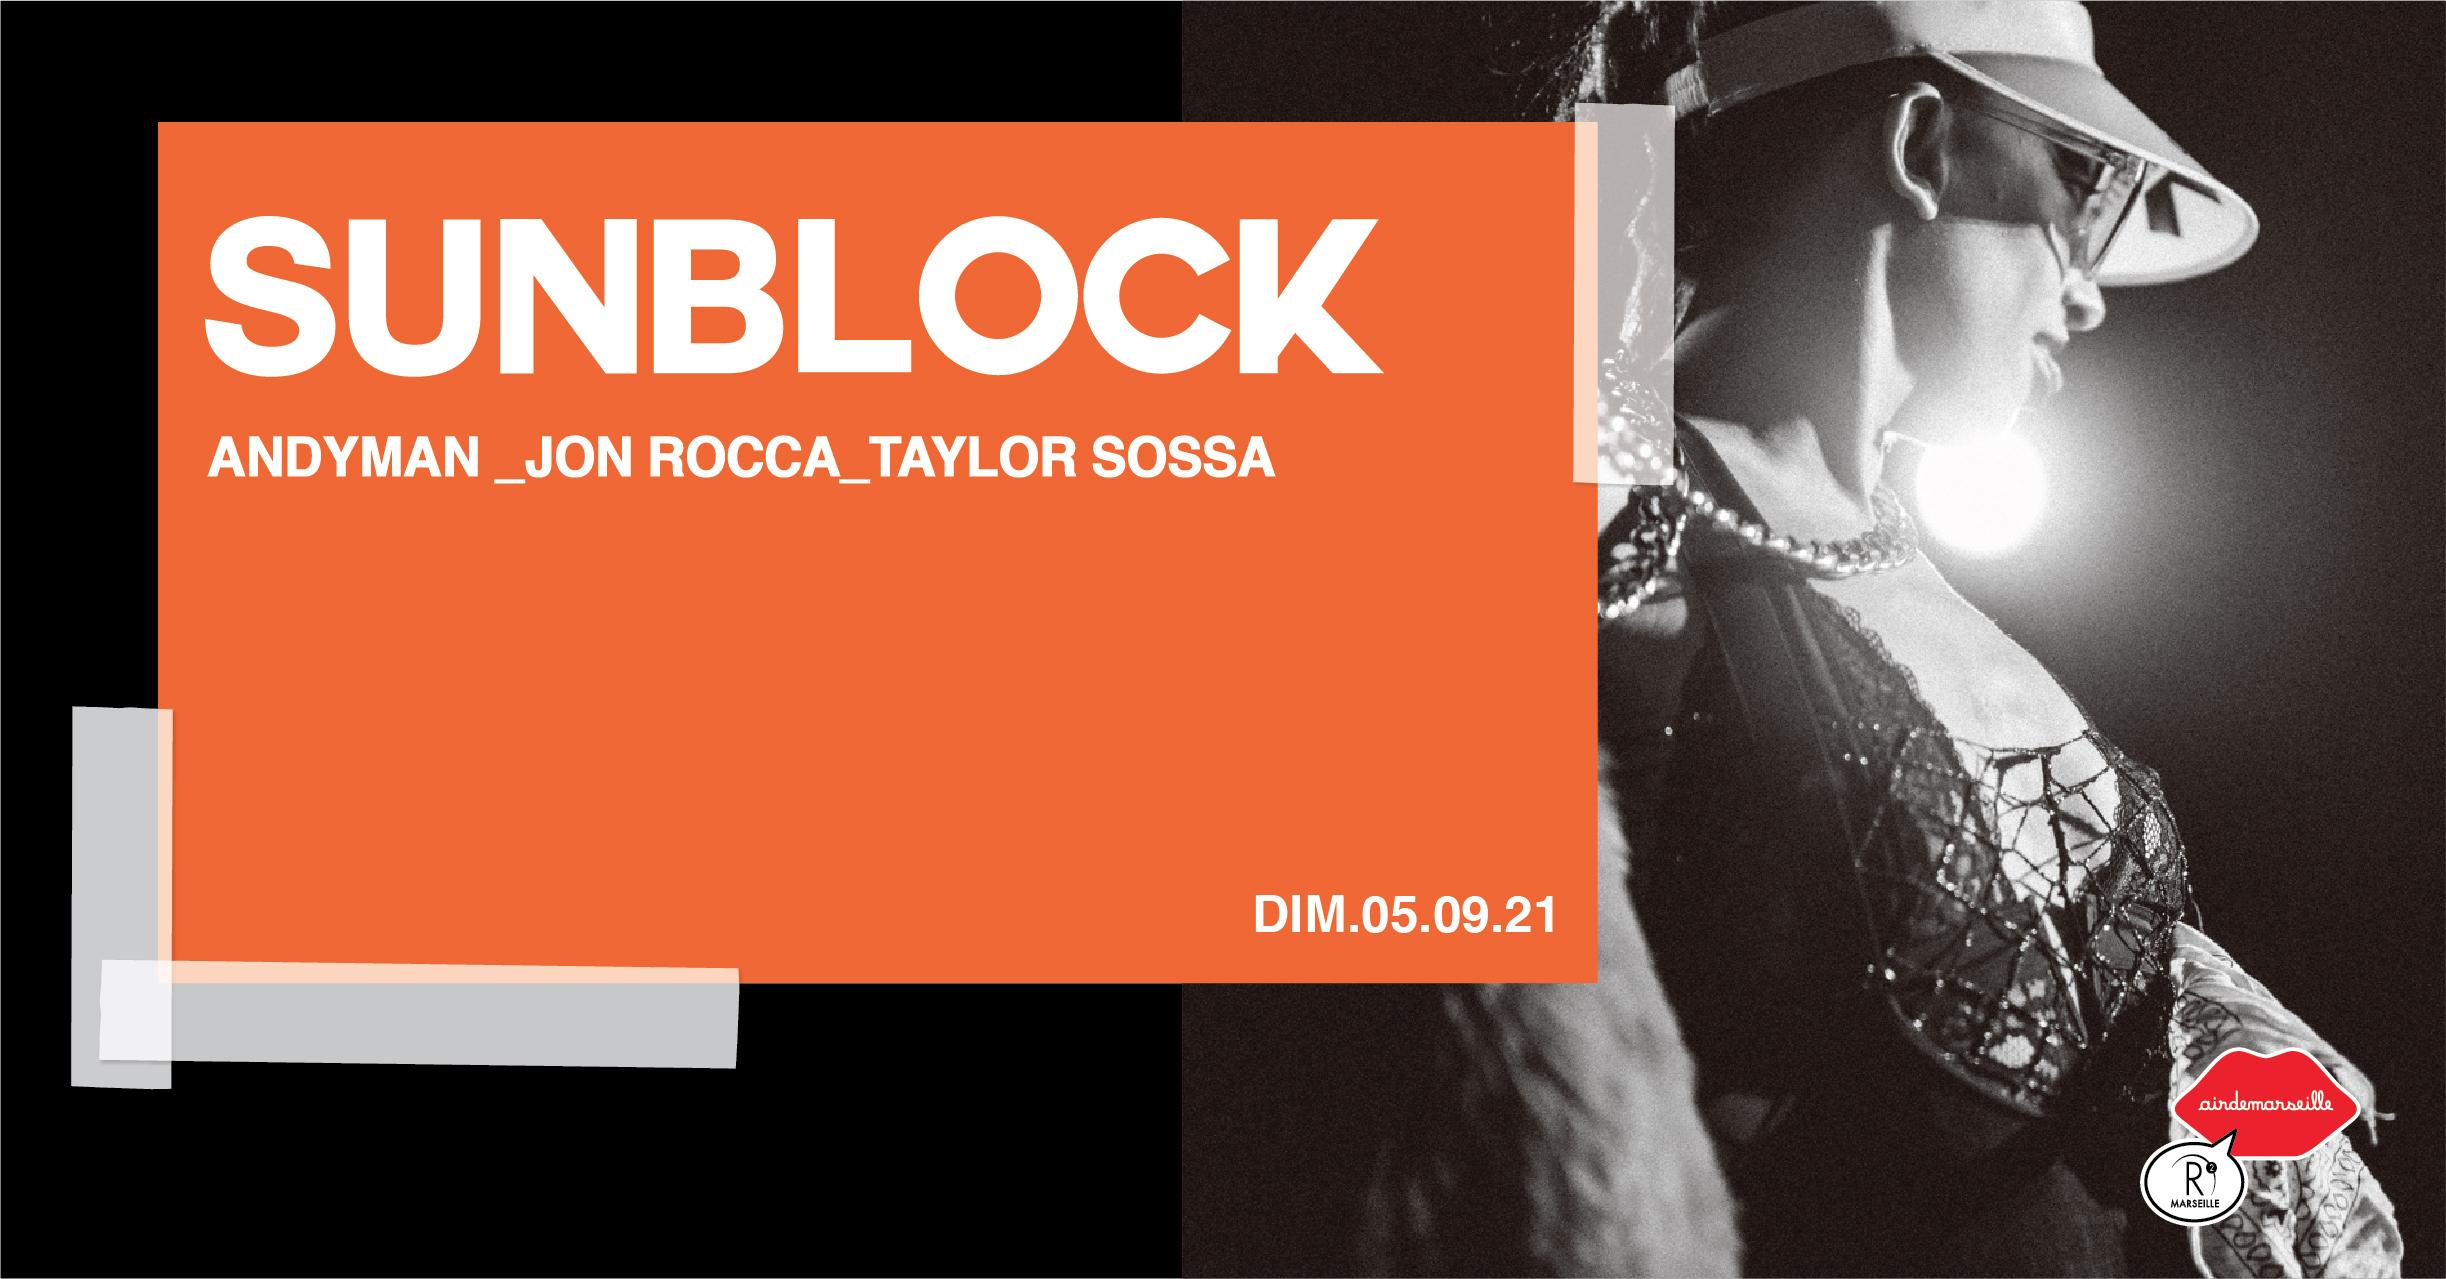 R2 ROOFTOP x SUNBLOCK - JON ROCCA - TAYLOR SOSSA -  ANDYMAN